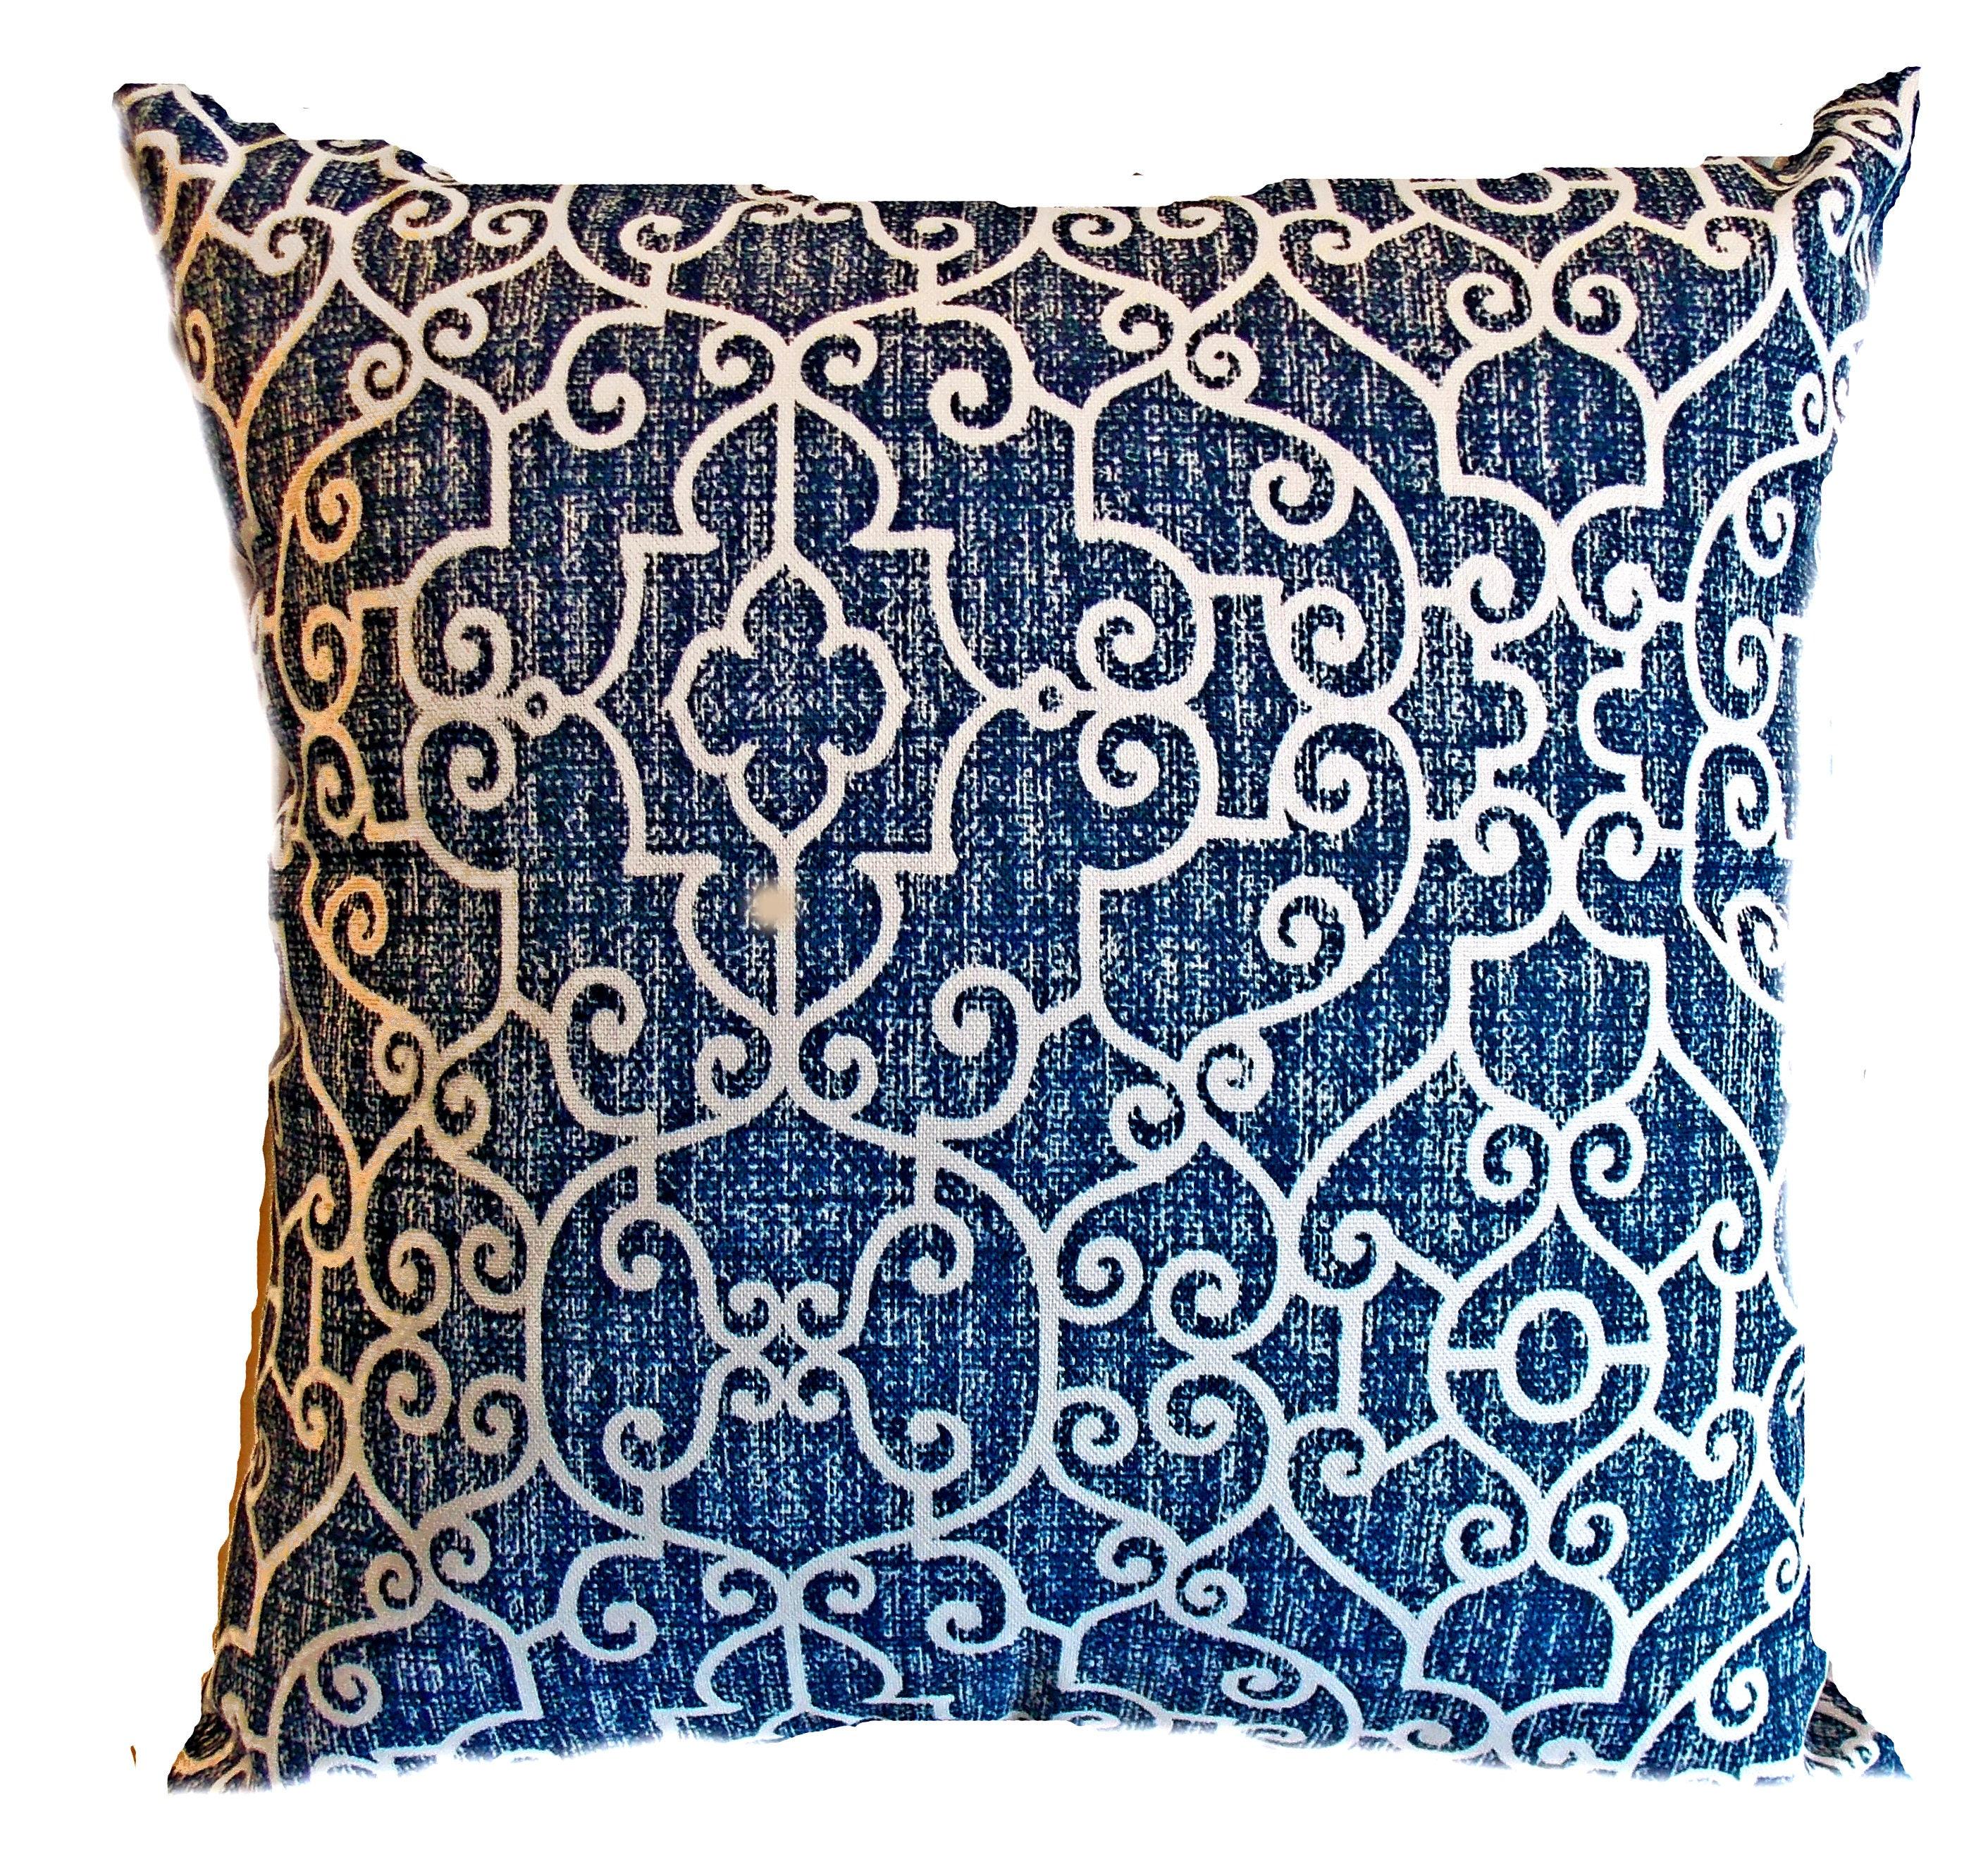 Pillow Pillows Cover Outdoor Indoor - Navy Blue White Lattice ...